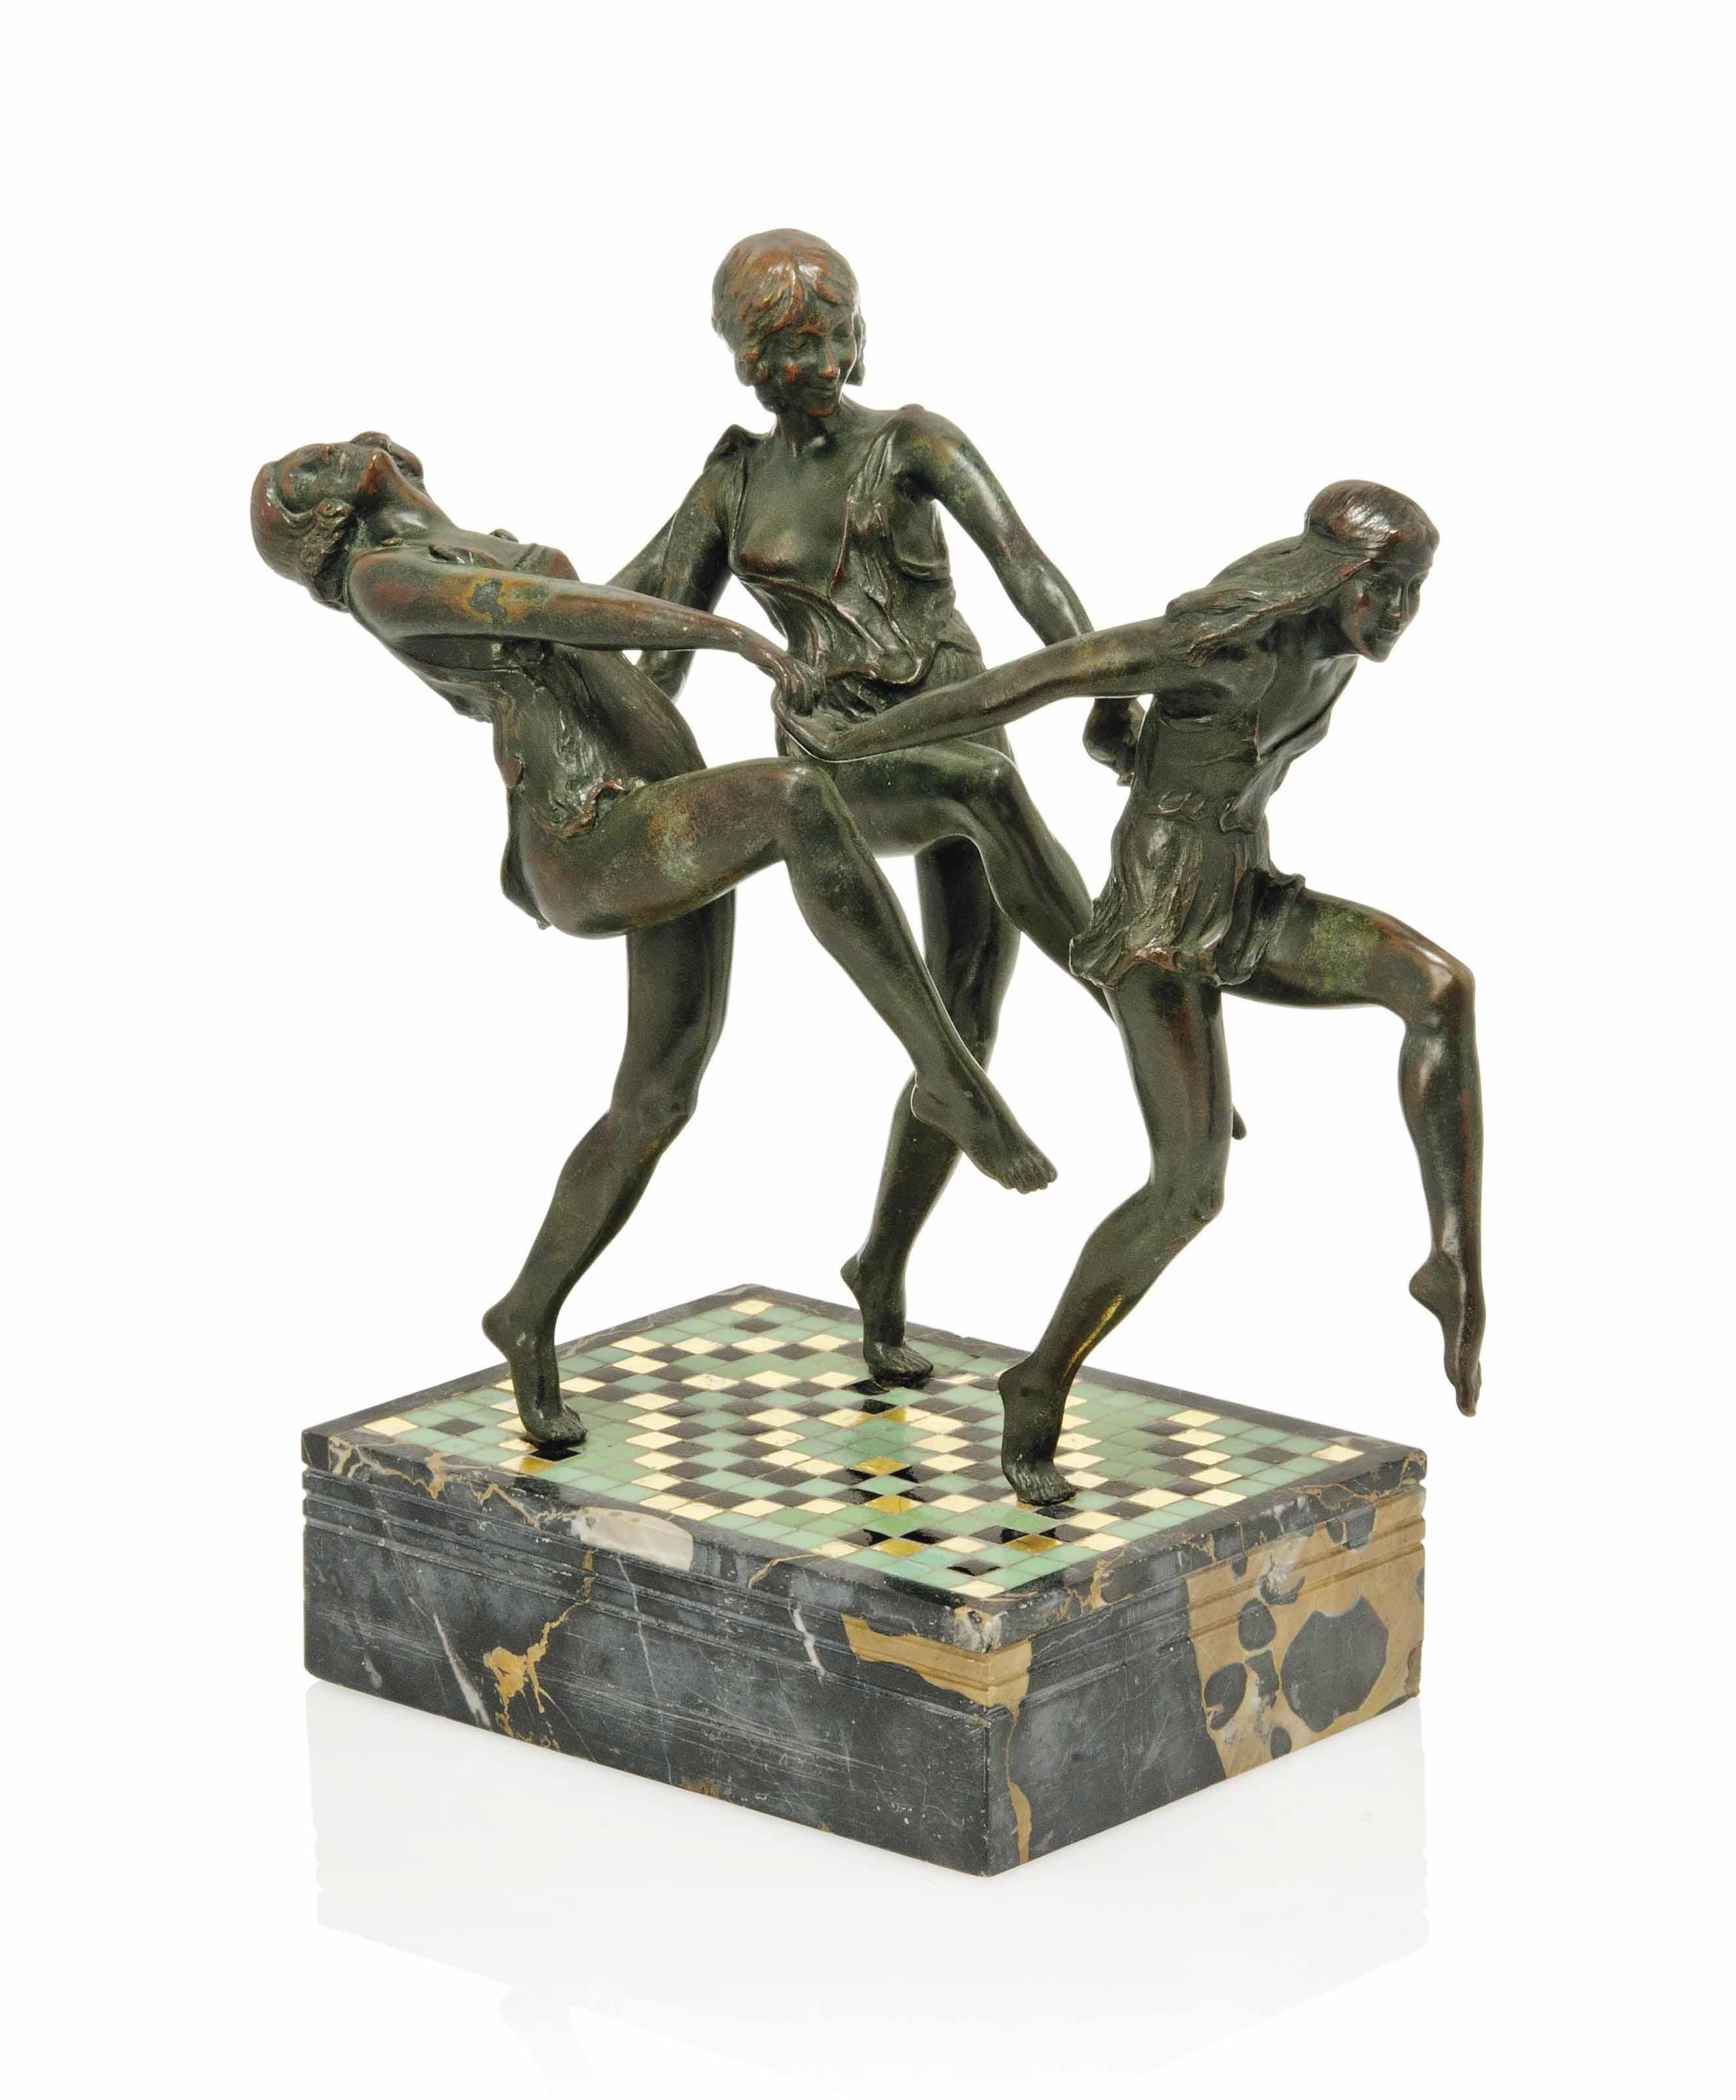 'THE DANCE', A PIERRE LE FAGUAYS COLD-PAINTED BRONZE GROUP